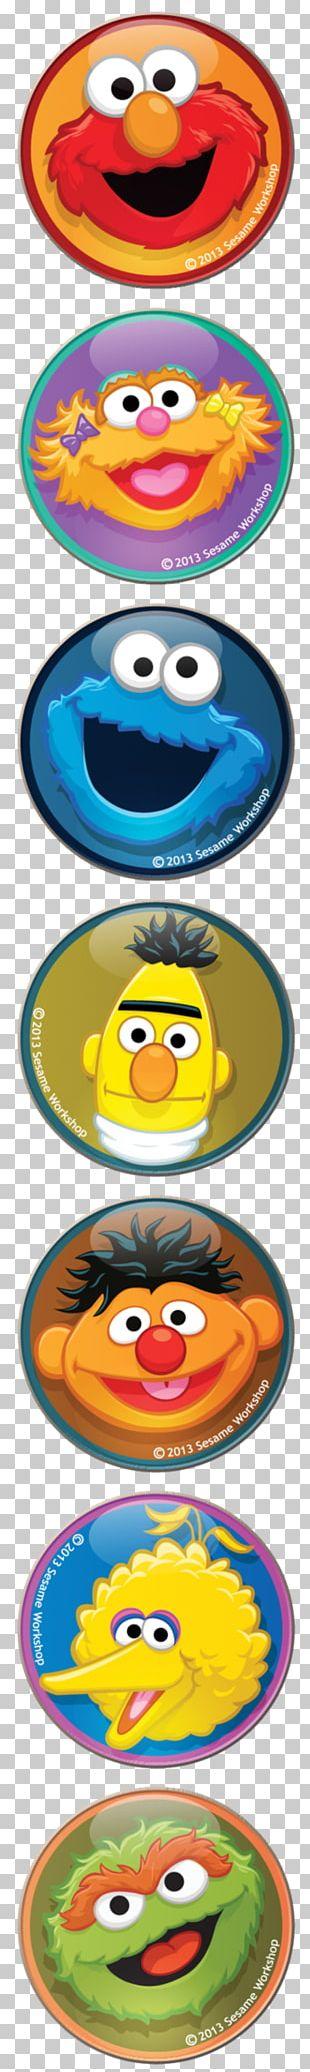 Oscar The Grouch Bert Cookie Monster Academy Awards Png